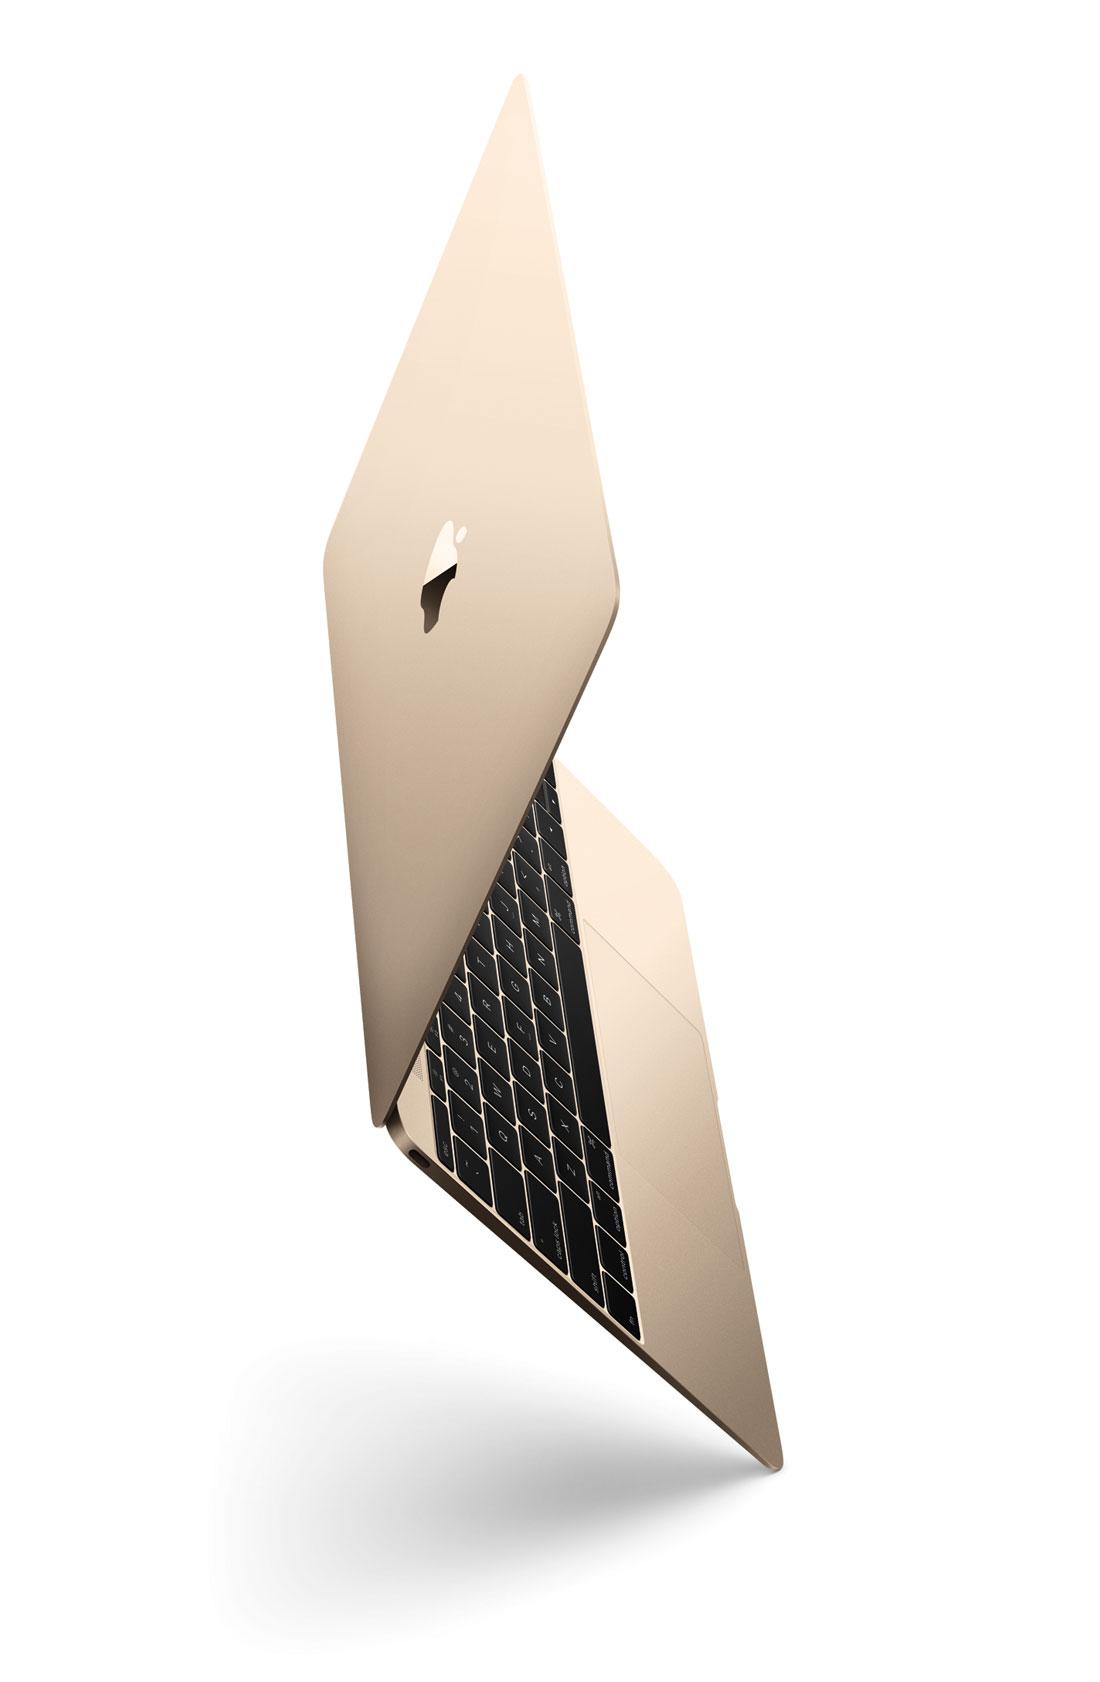 TE_Apple_News_MAerz2015_MacBook_OP90